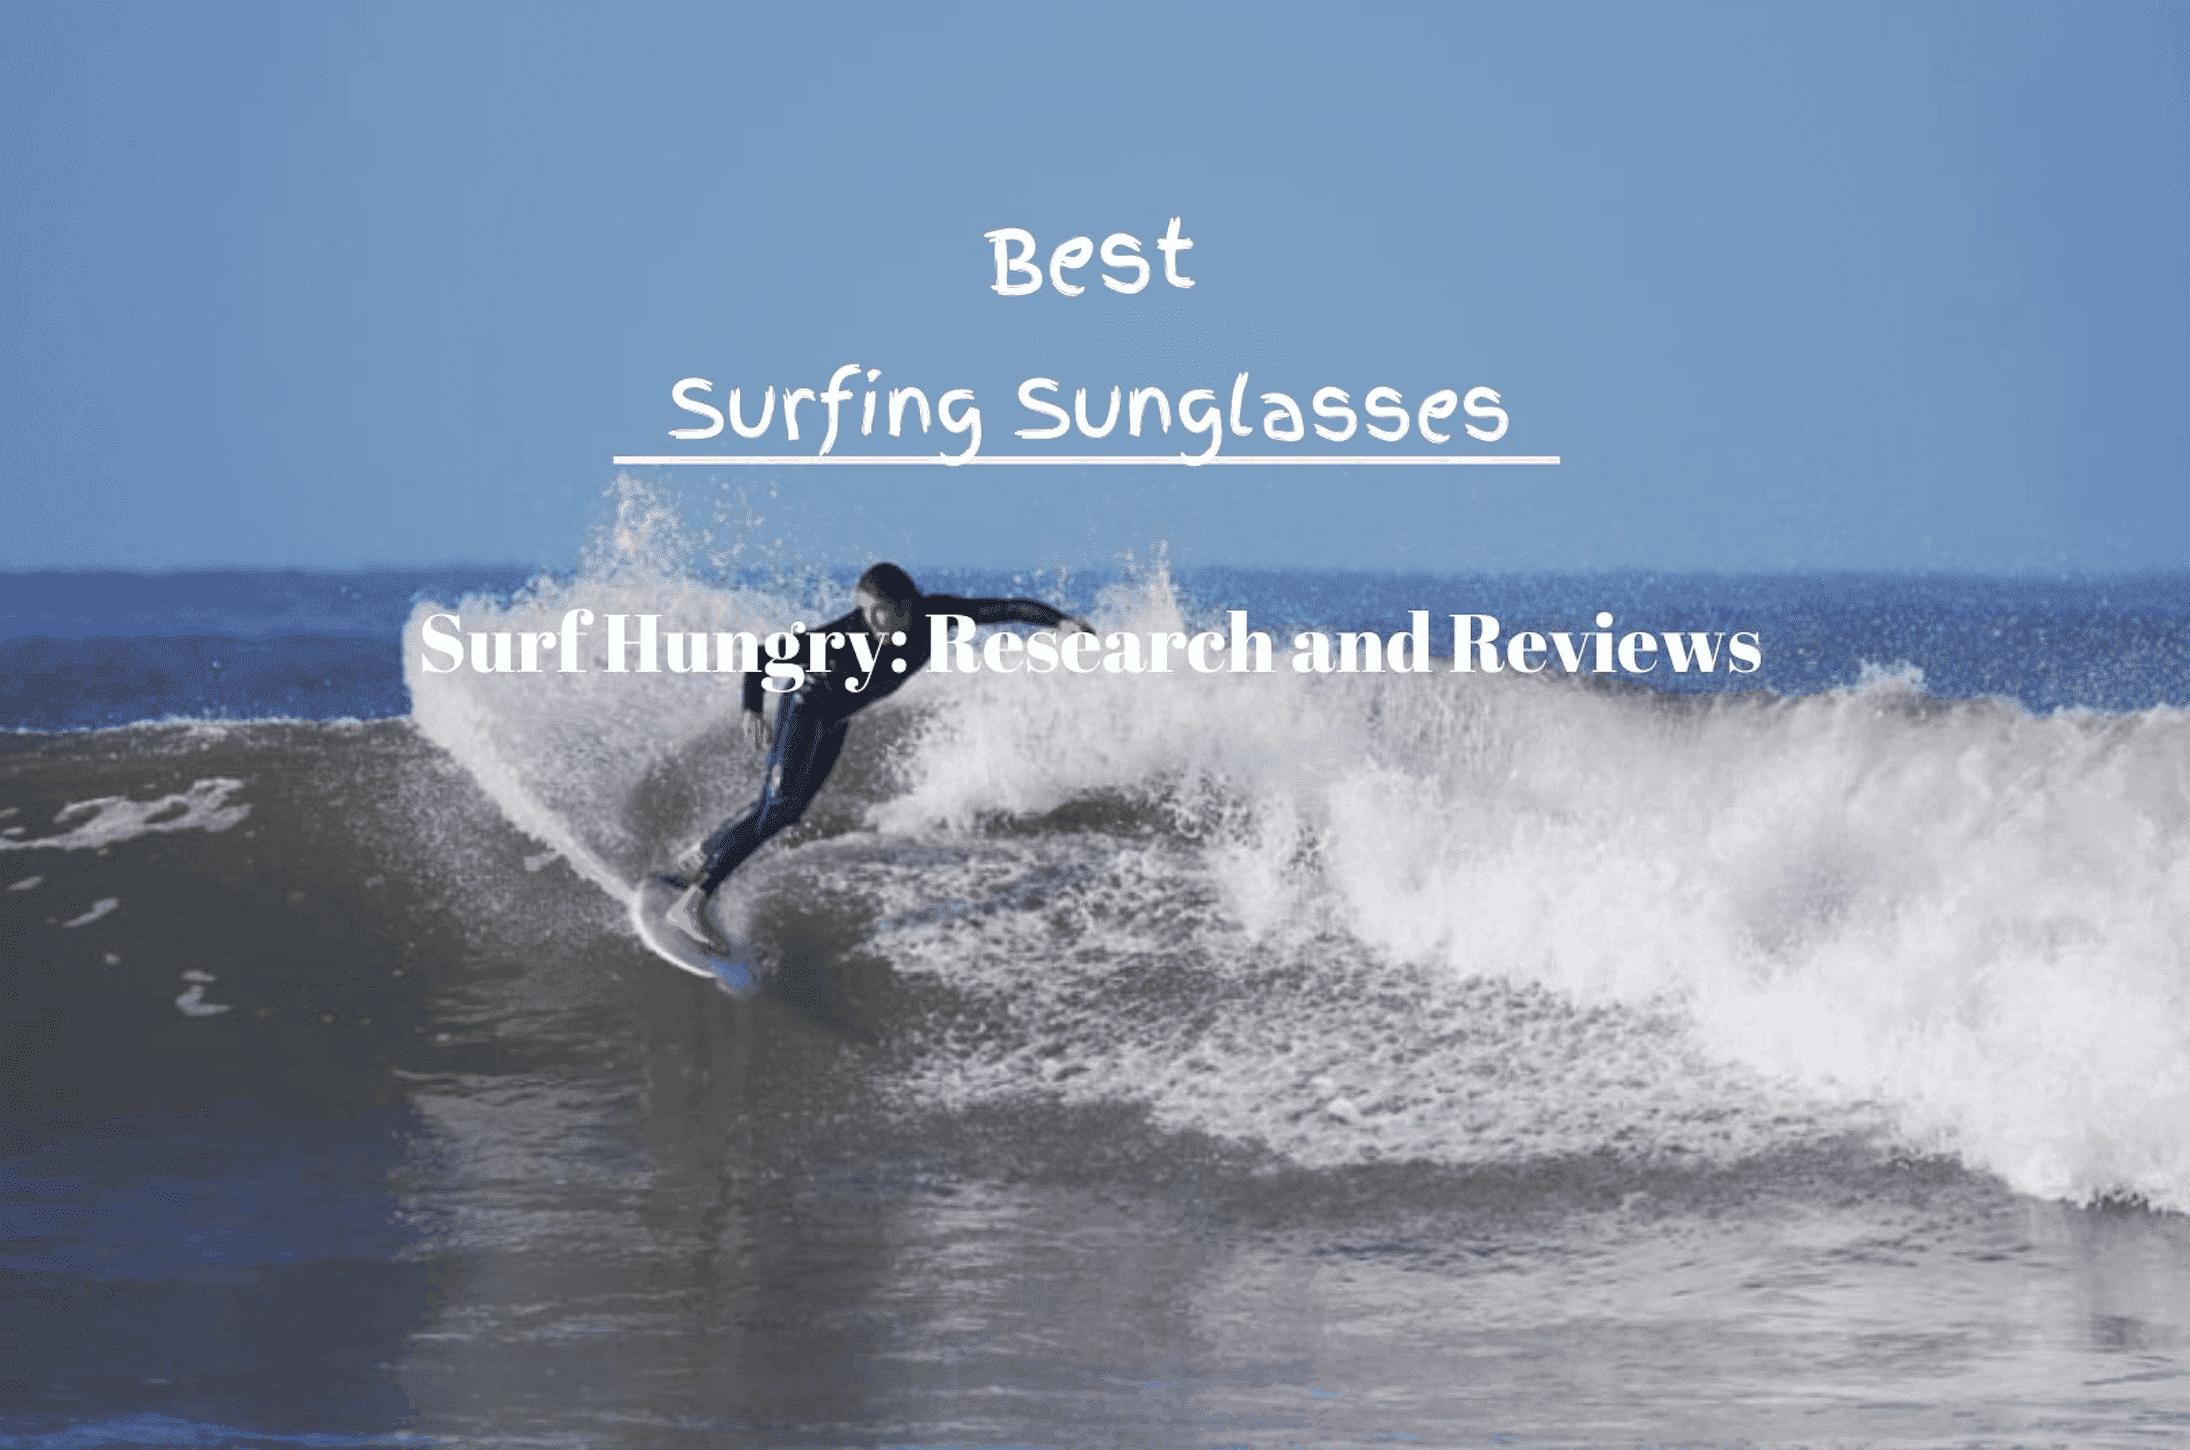 best surfing sunglasses